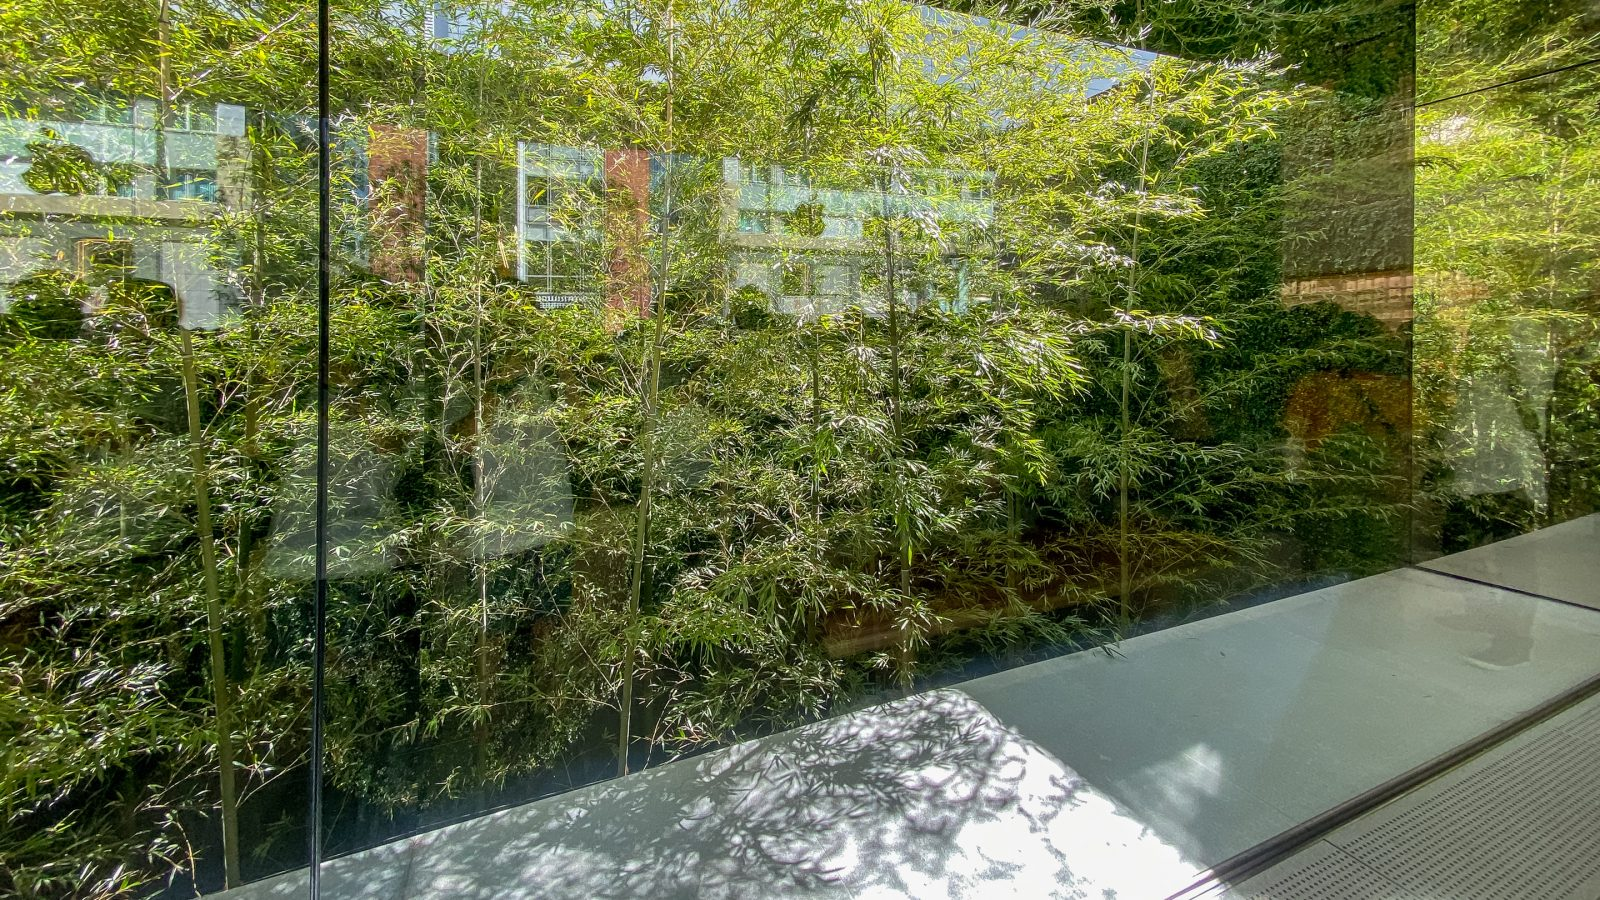 All-new Apple Fukuoka opens with Japanese shoji screen and bamboo garden